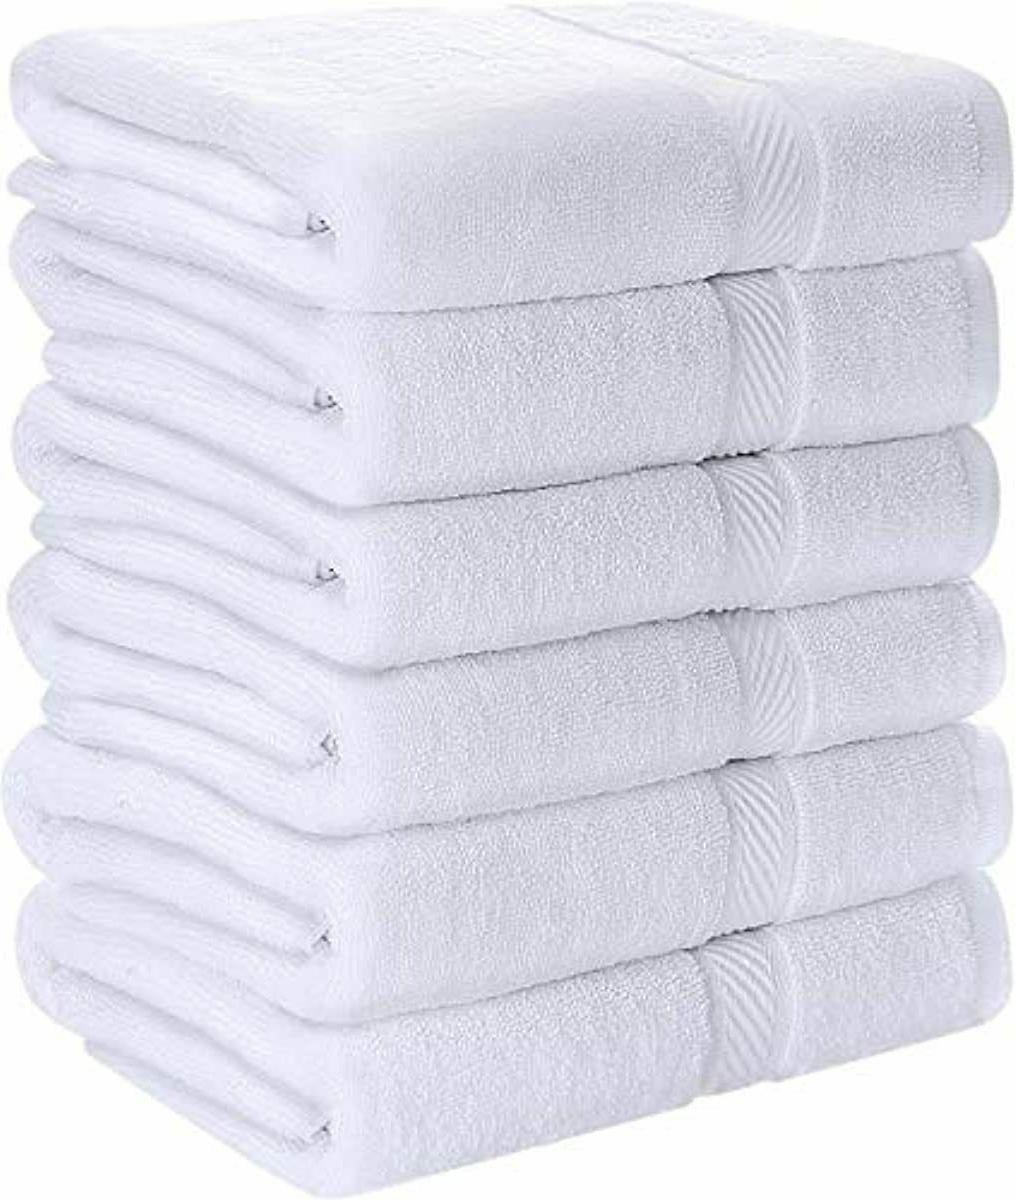 utopia towels cotton towels white 22 x